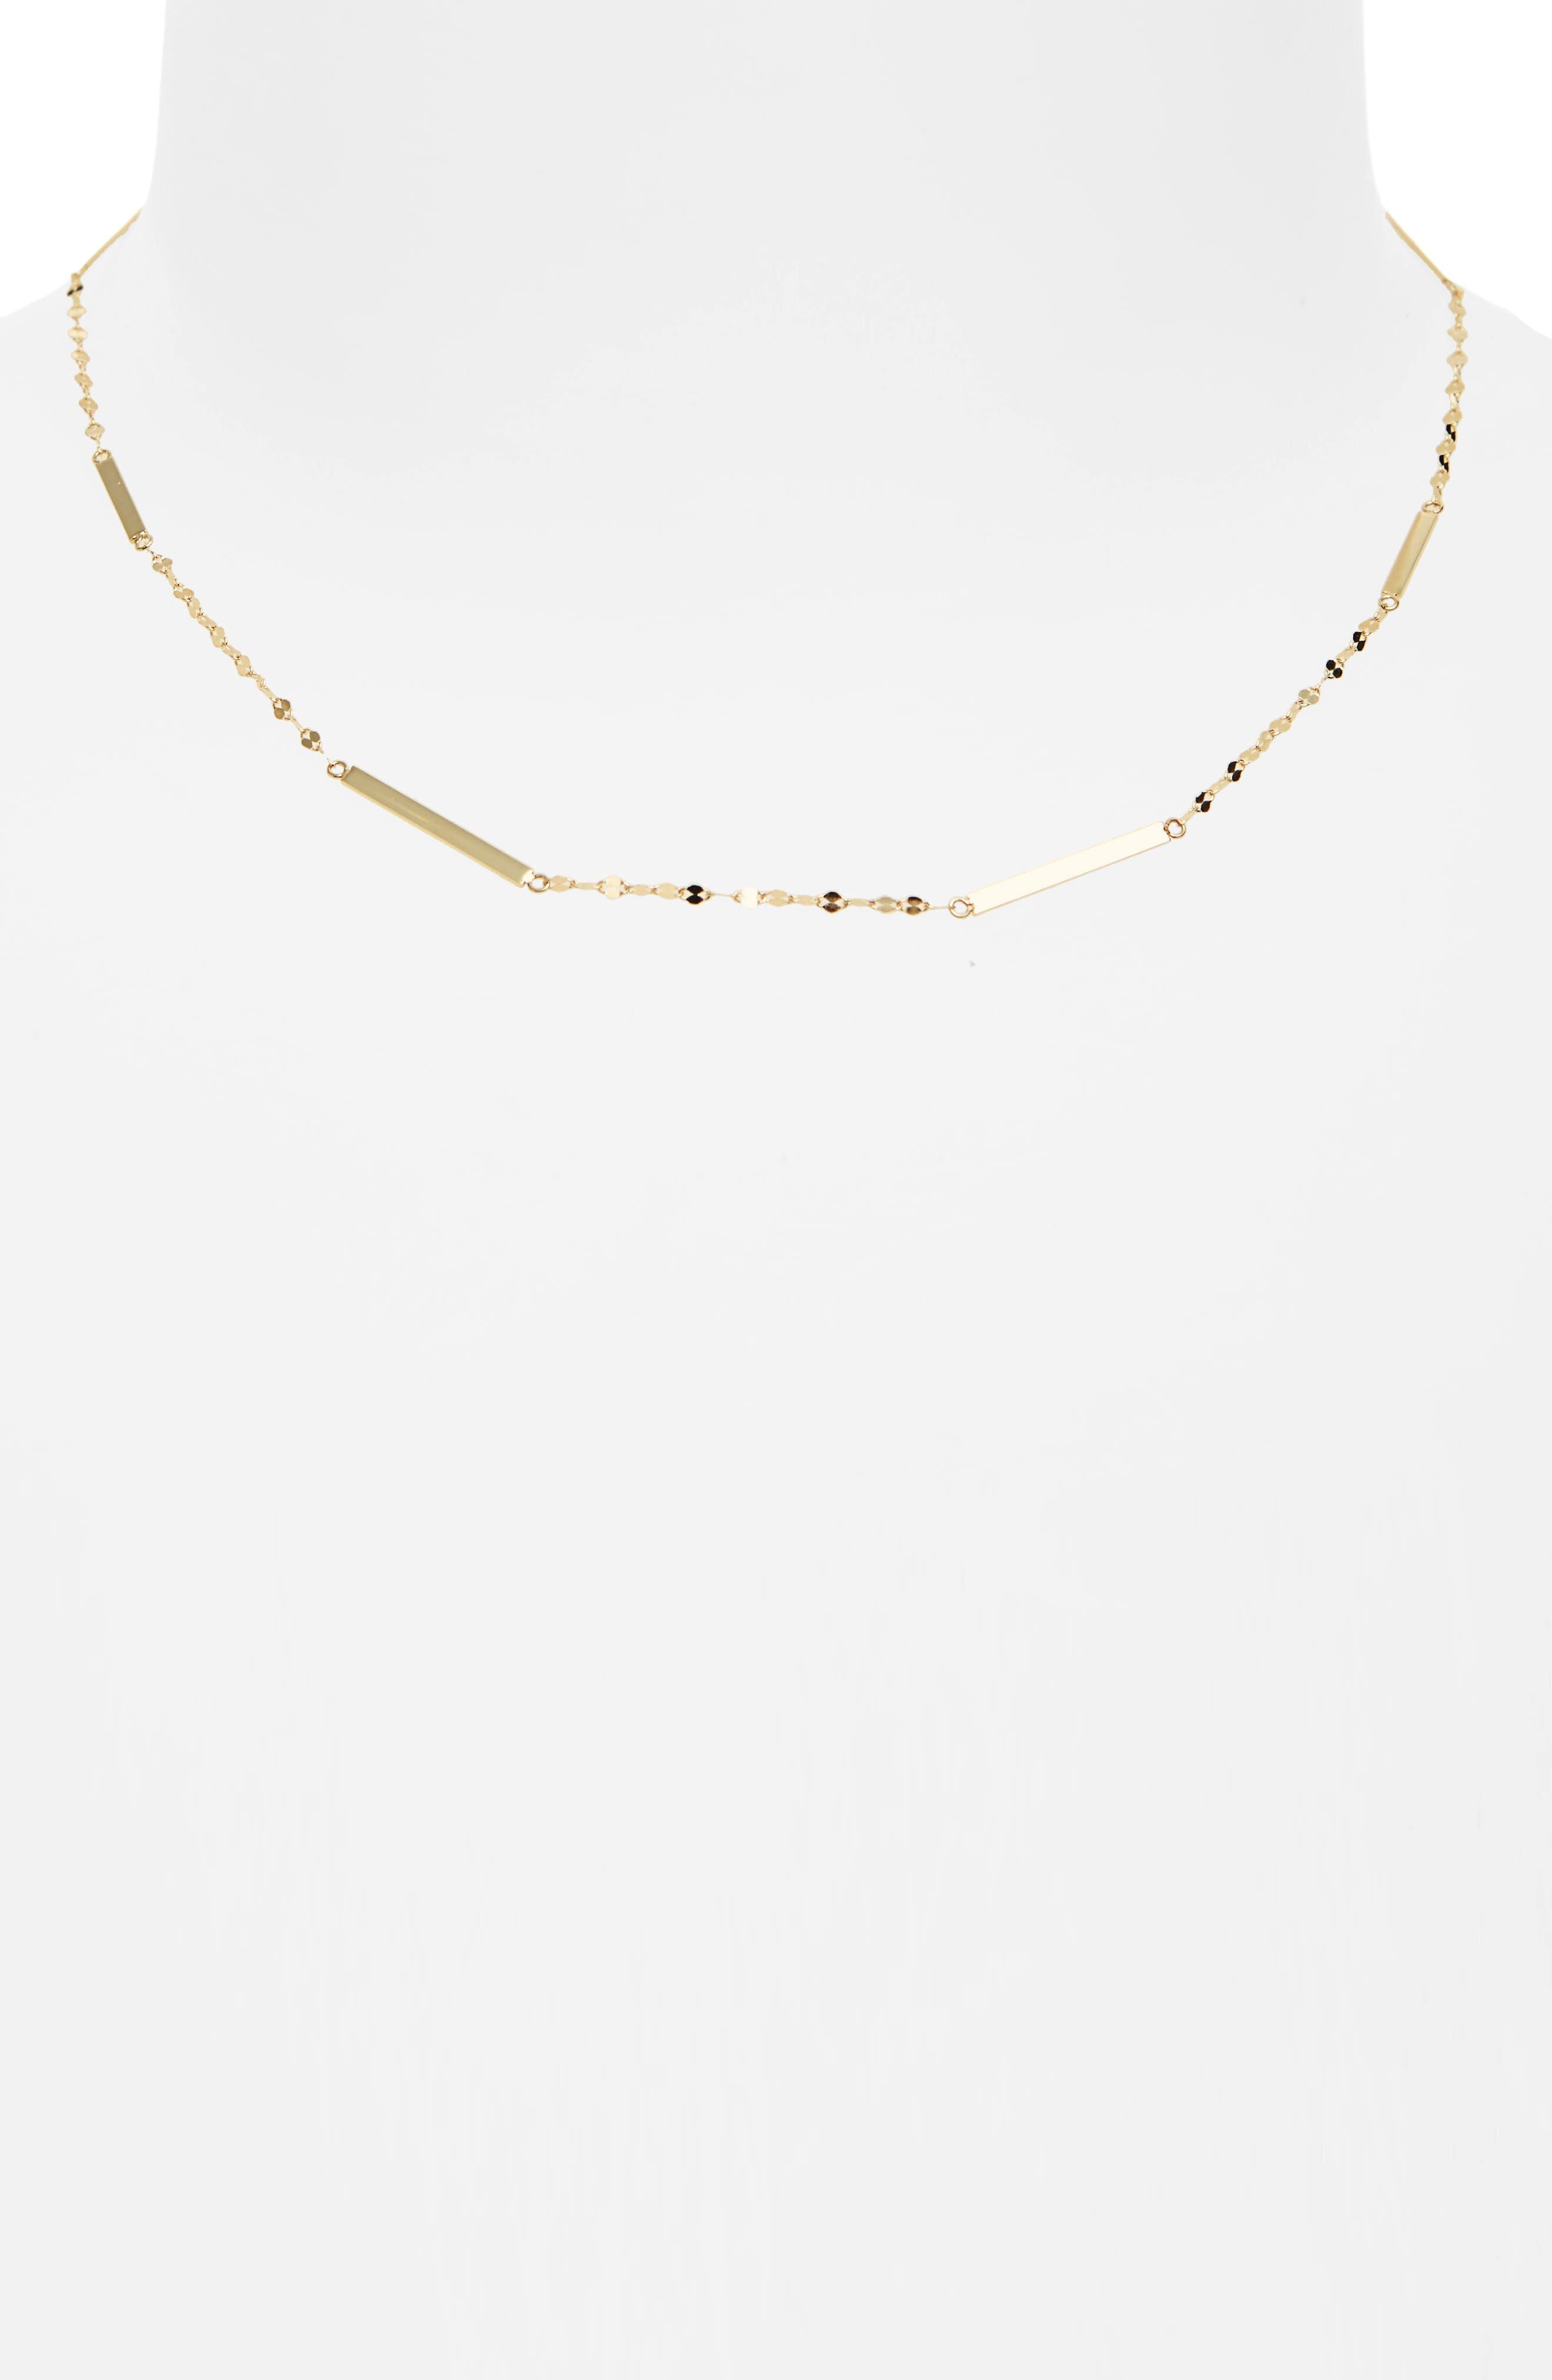 Lana Jewelry Short Bar Station Necklace